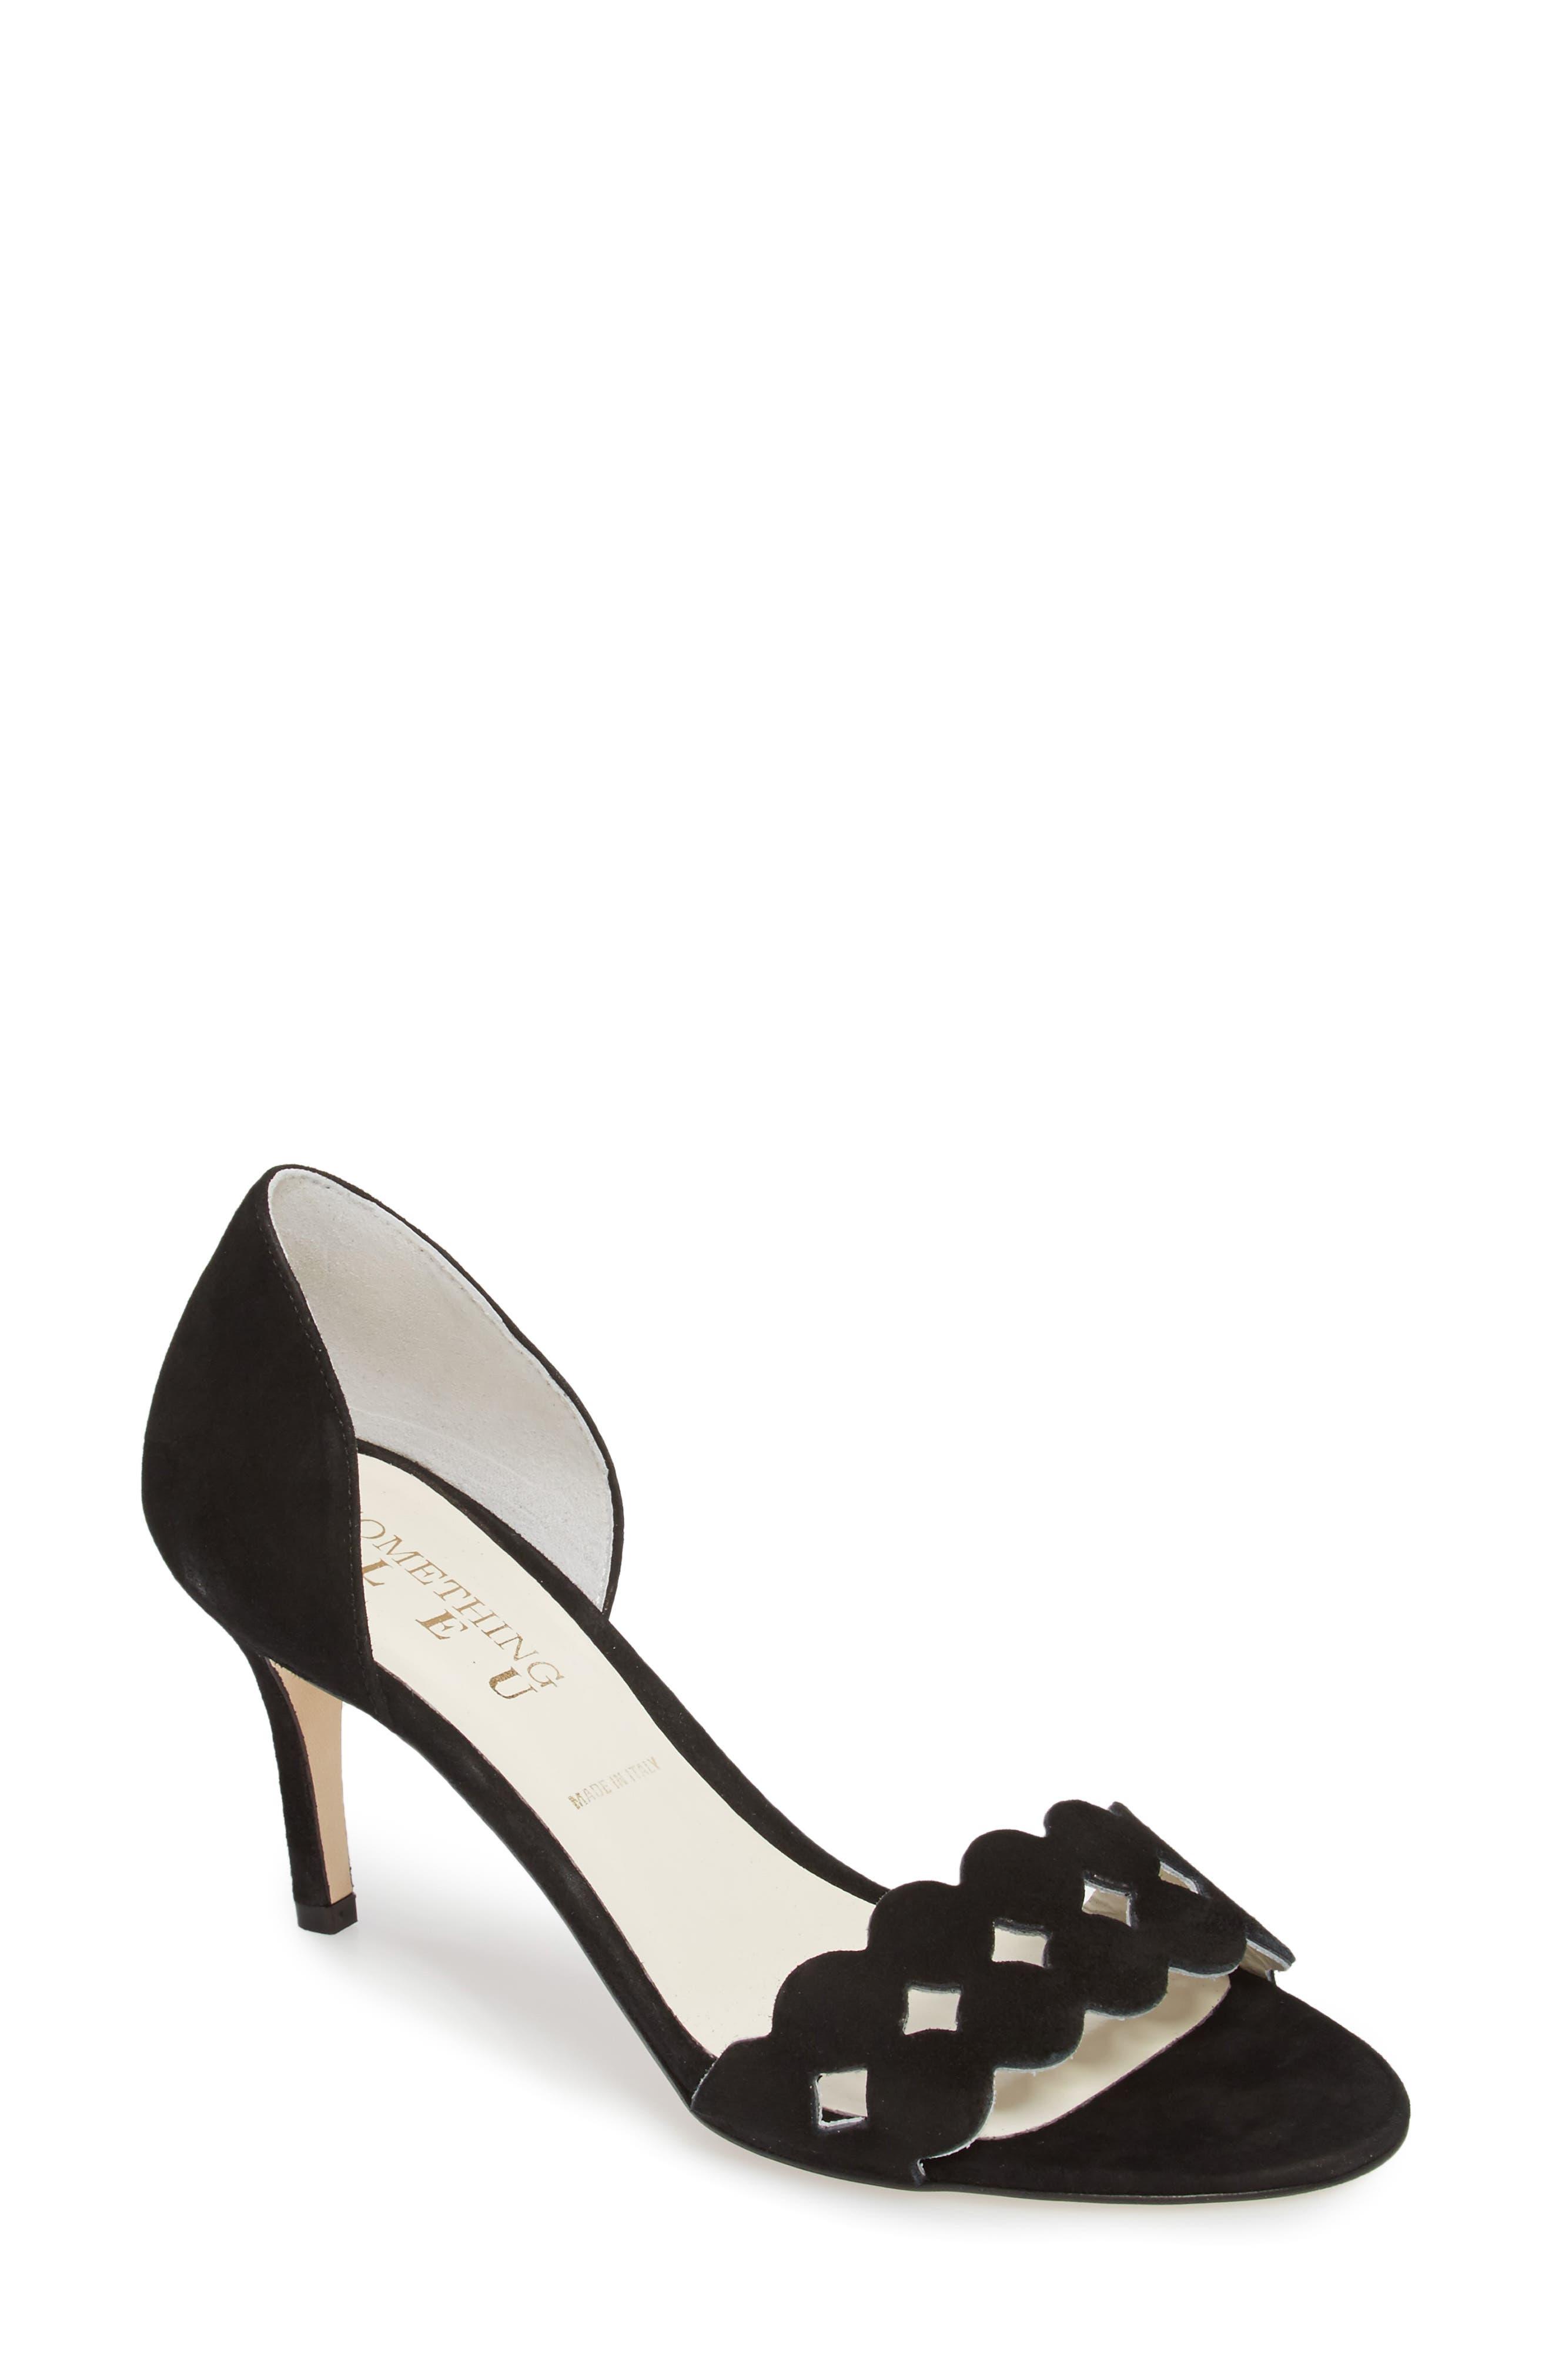 SOMETHING BLEU Women's Godiva Imitation Pearl Buckle Sandal 1MTpZ